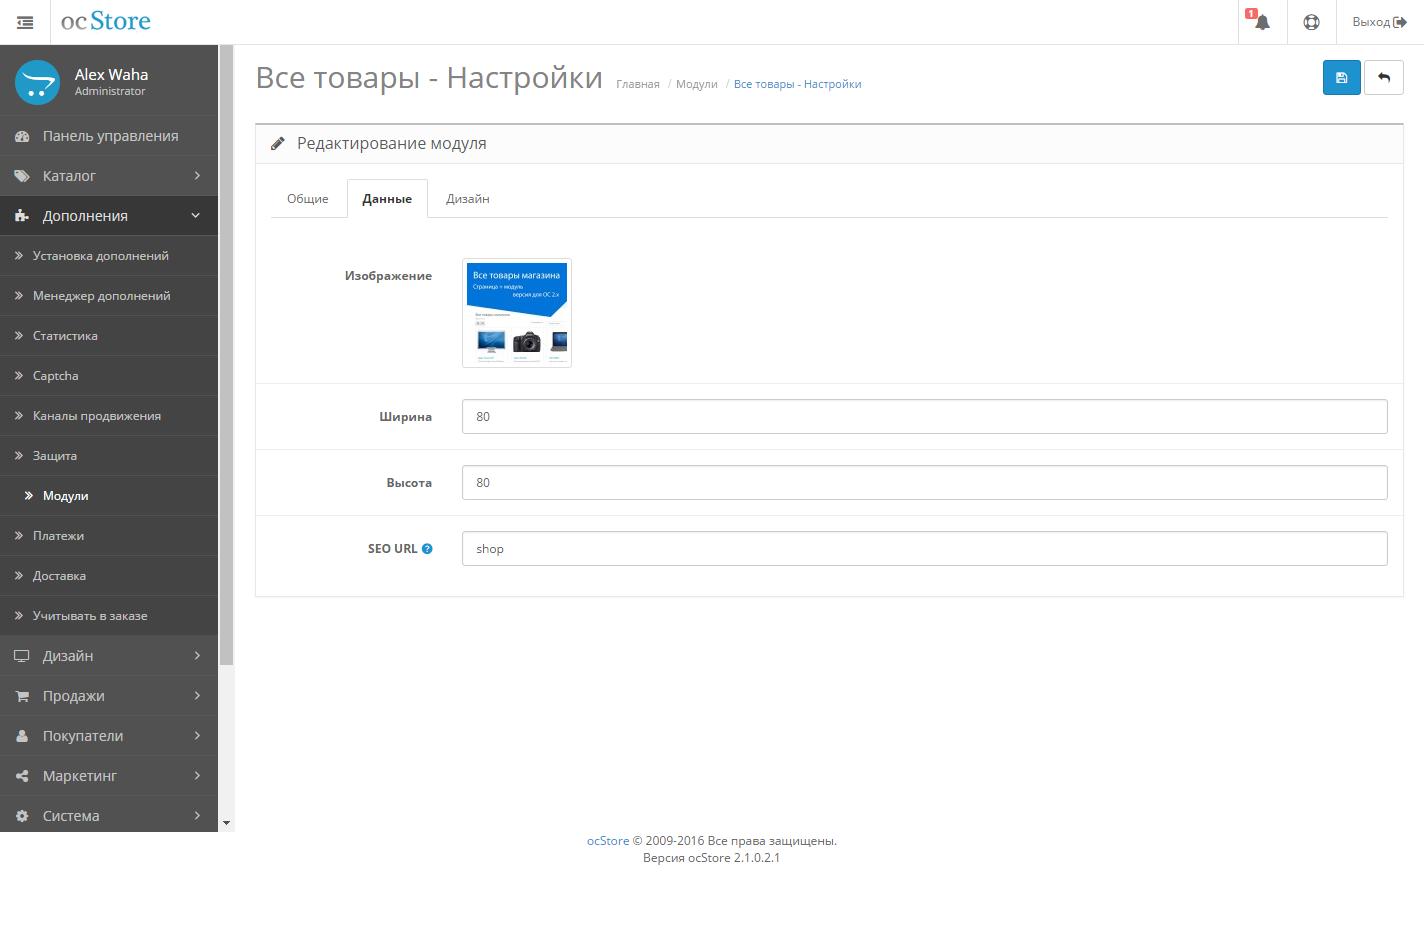 Установка опенкарт на хостинг рег ру каталог сайтов топ